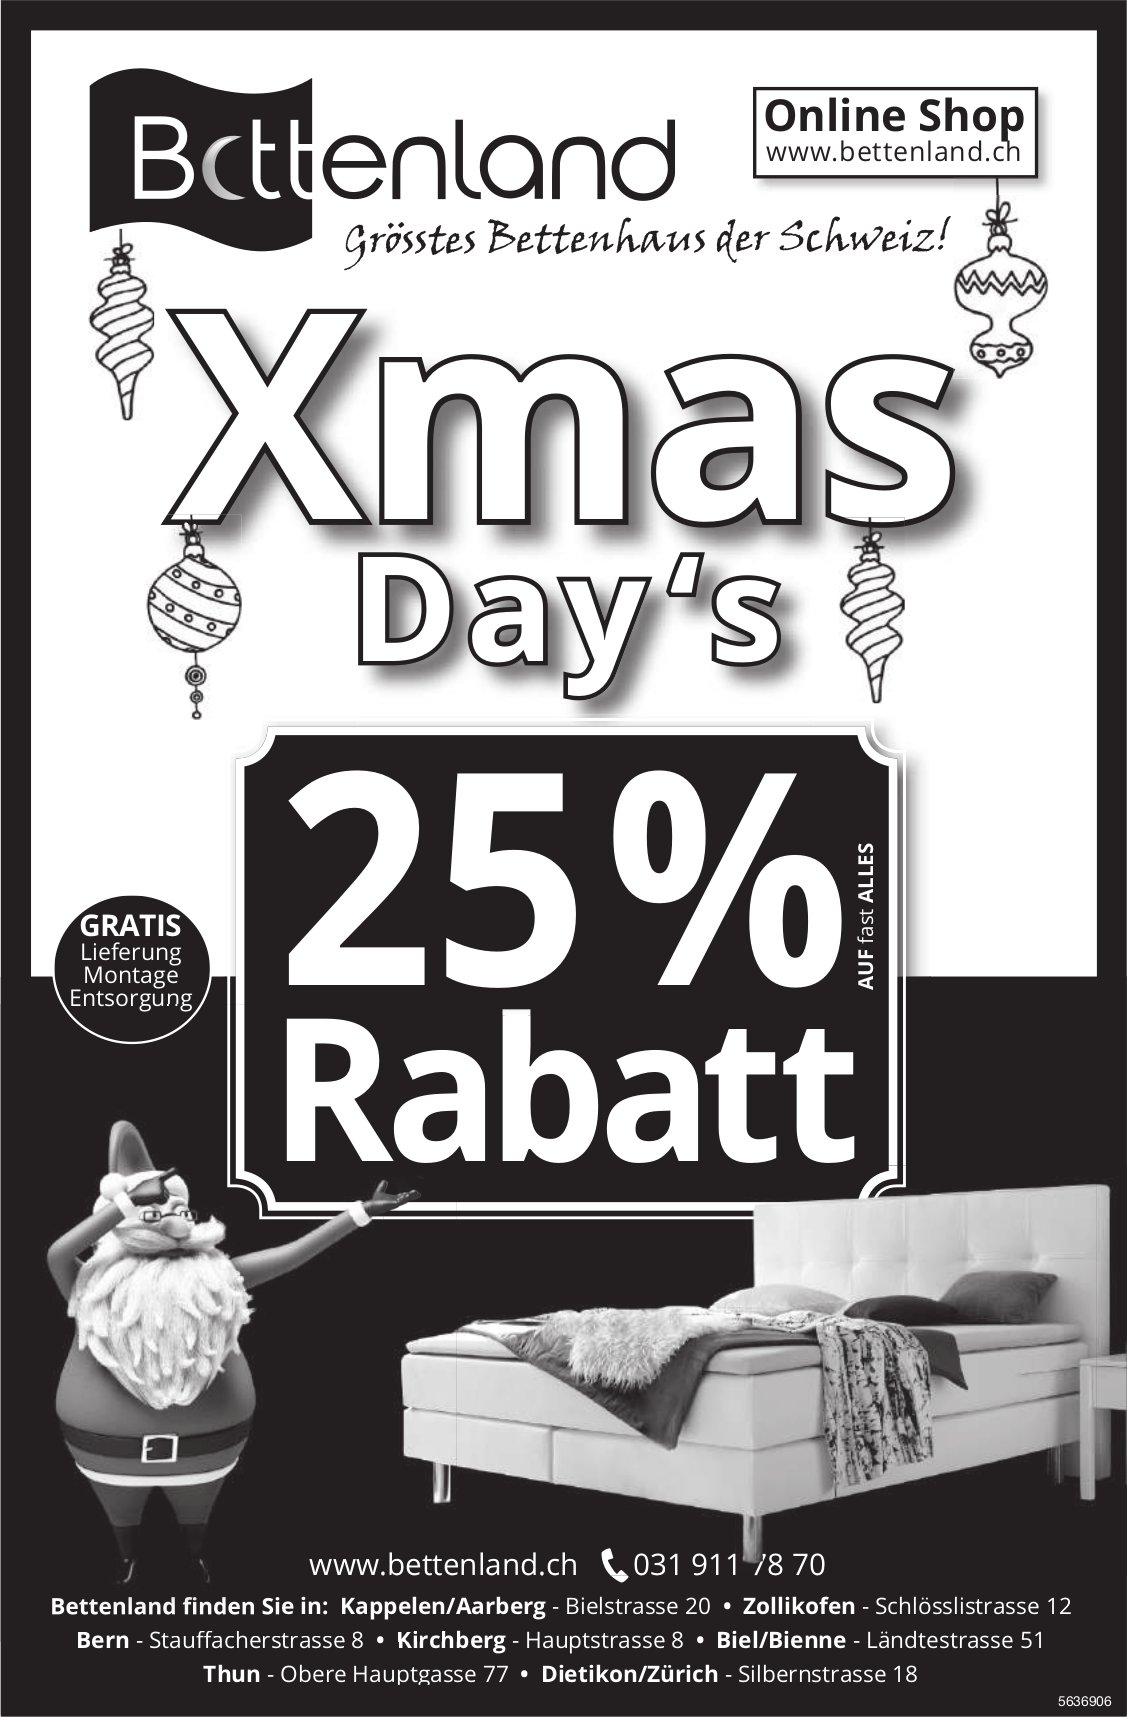 Bettenland - Xmas Day 's, 25% Rabatt